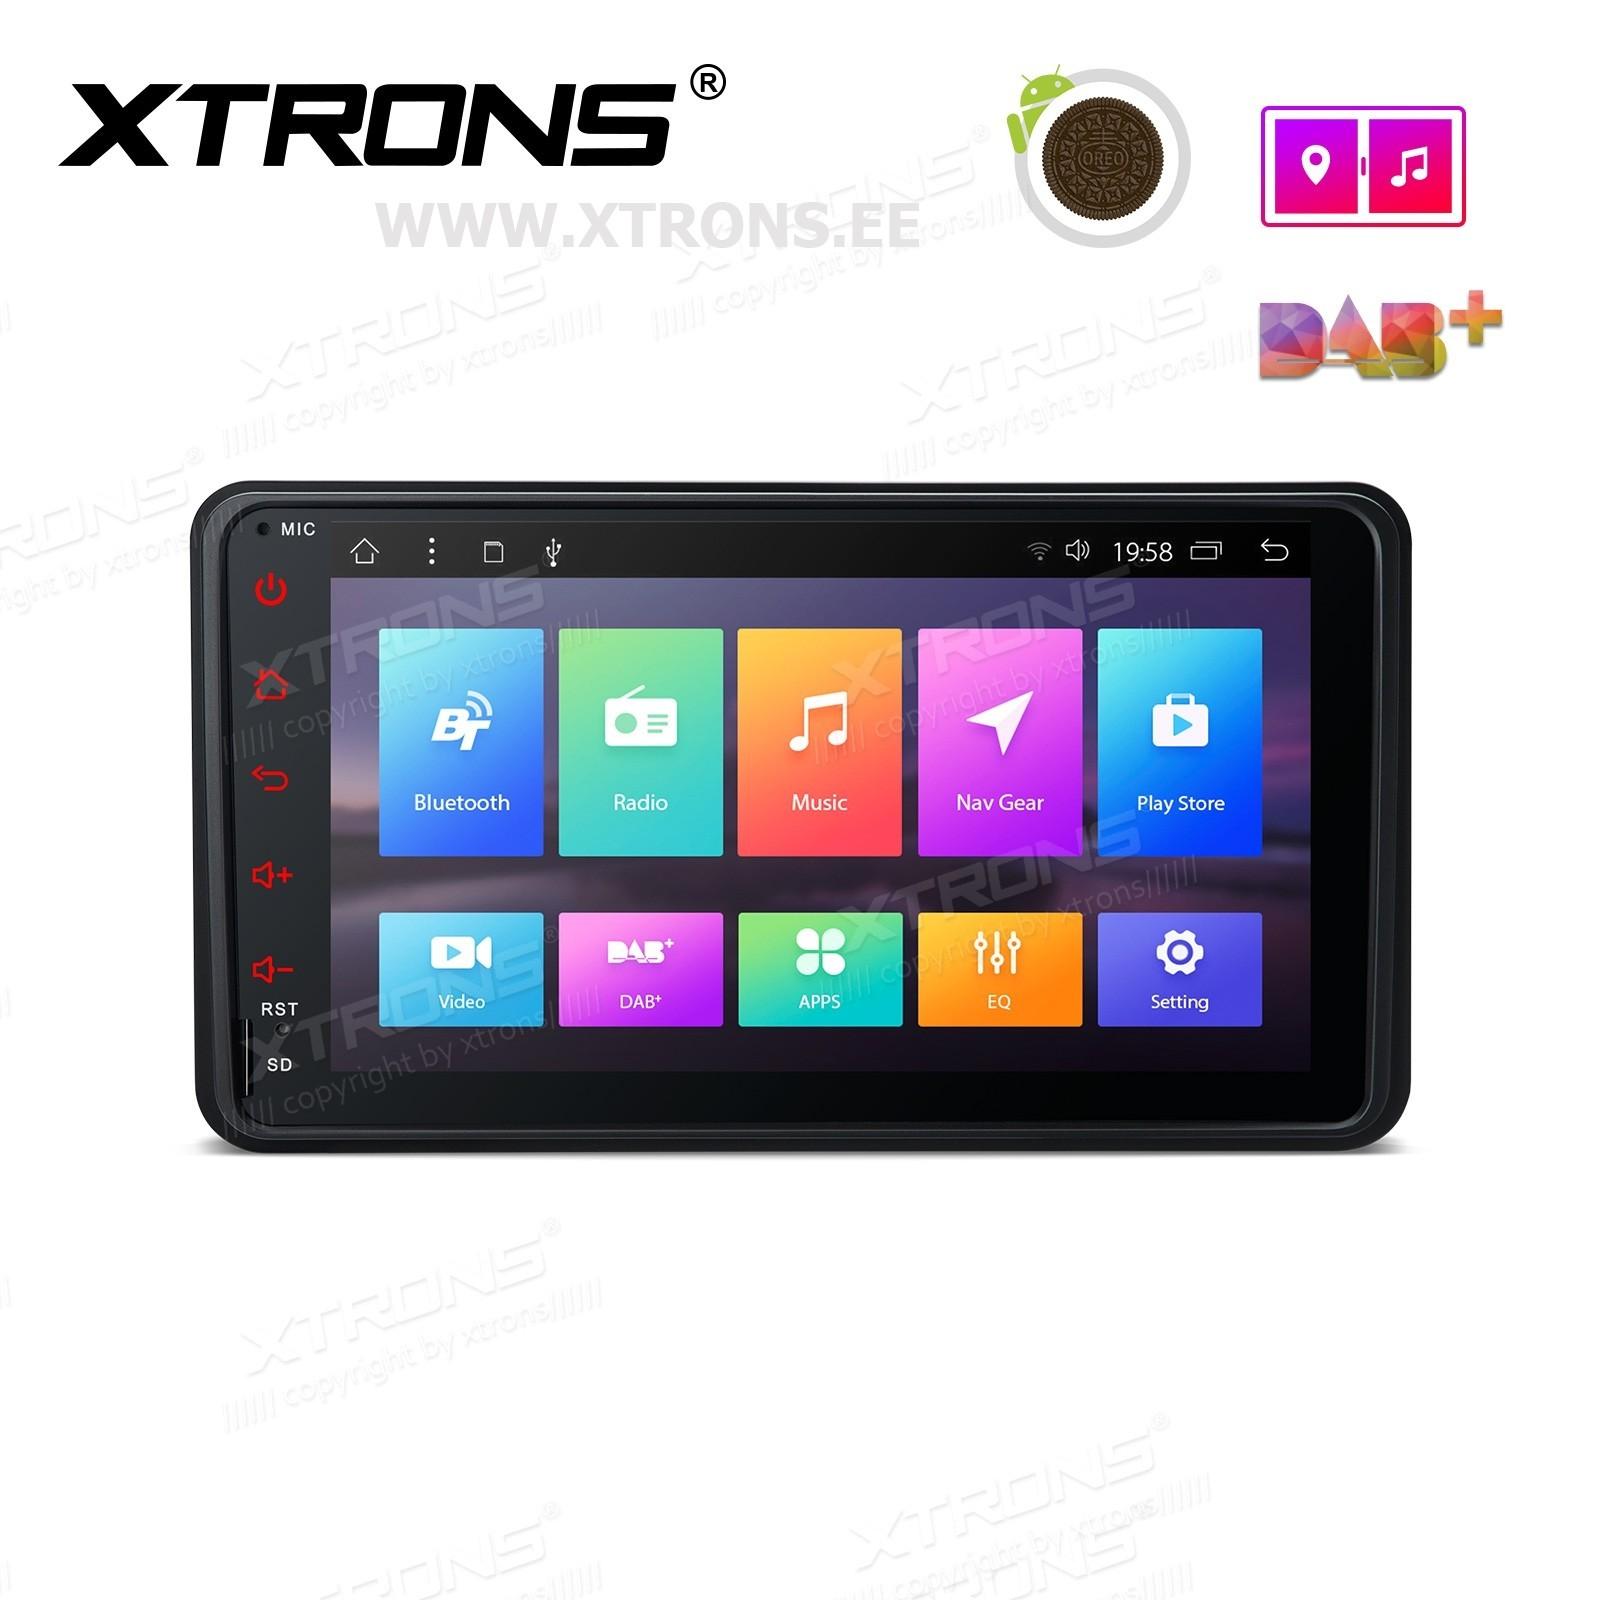 XTRONS PR78JMSL